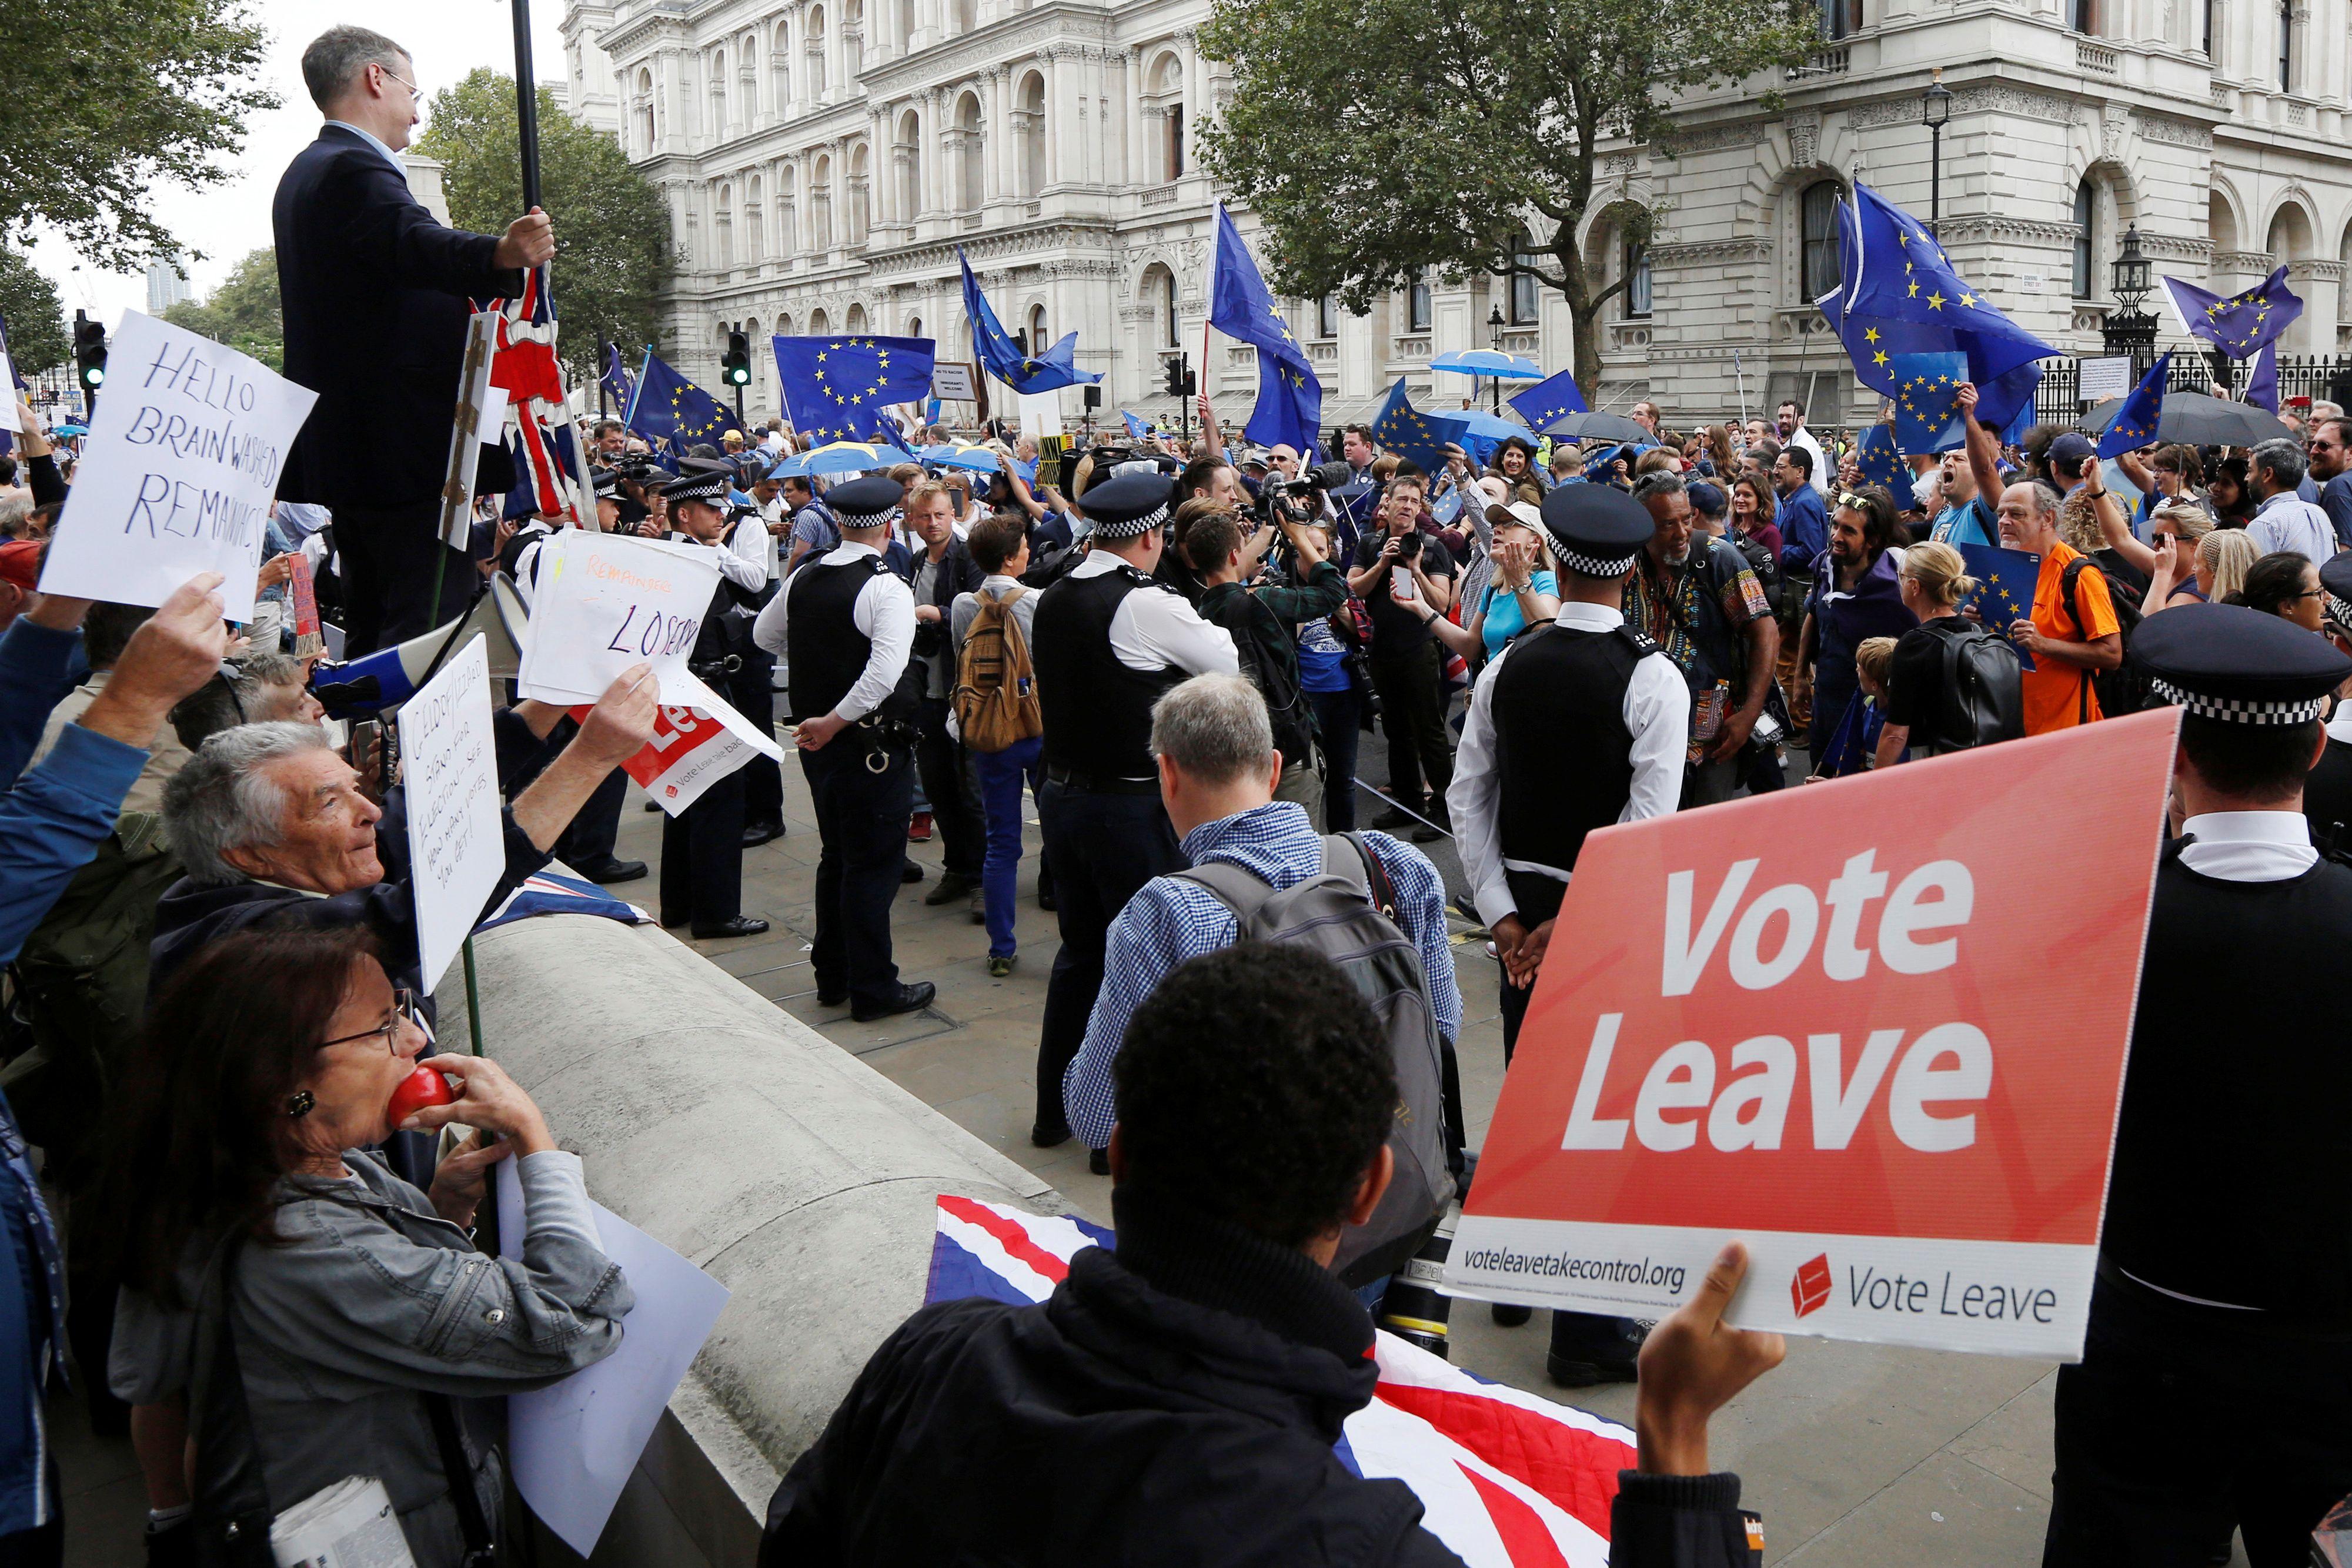 Jungtin� Karalyst� pasitrauks, bet jos �sipareigojimai ES � liks